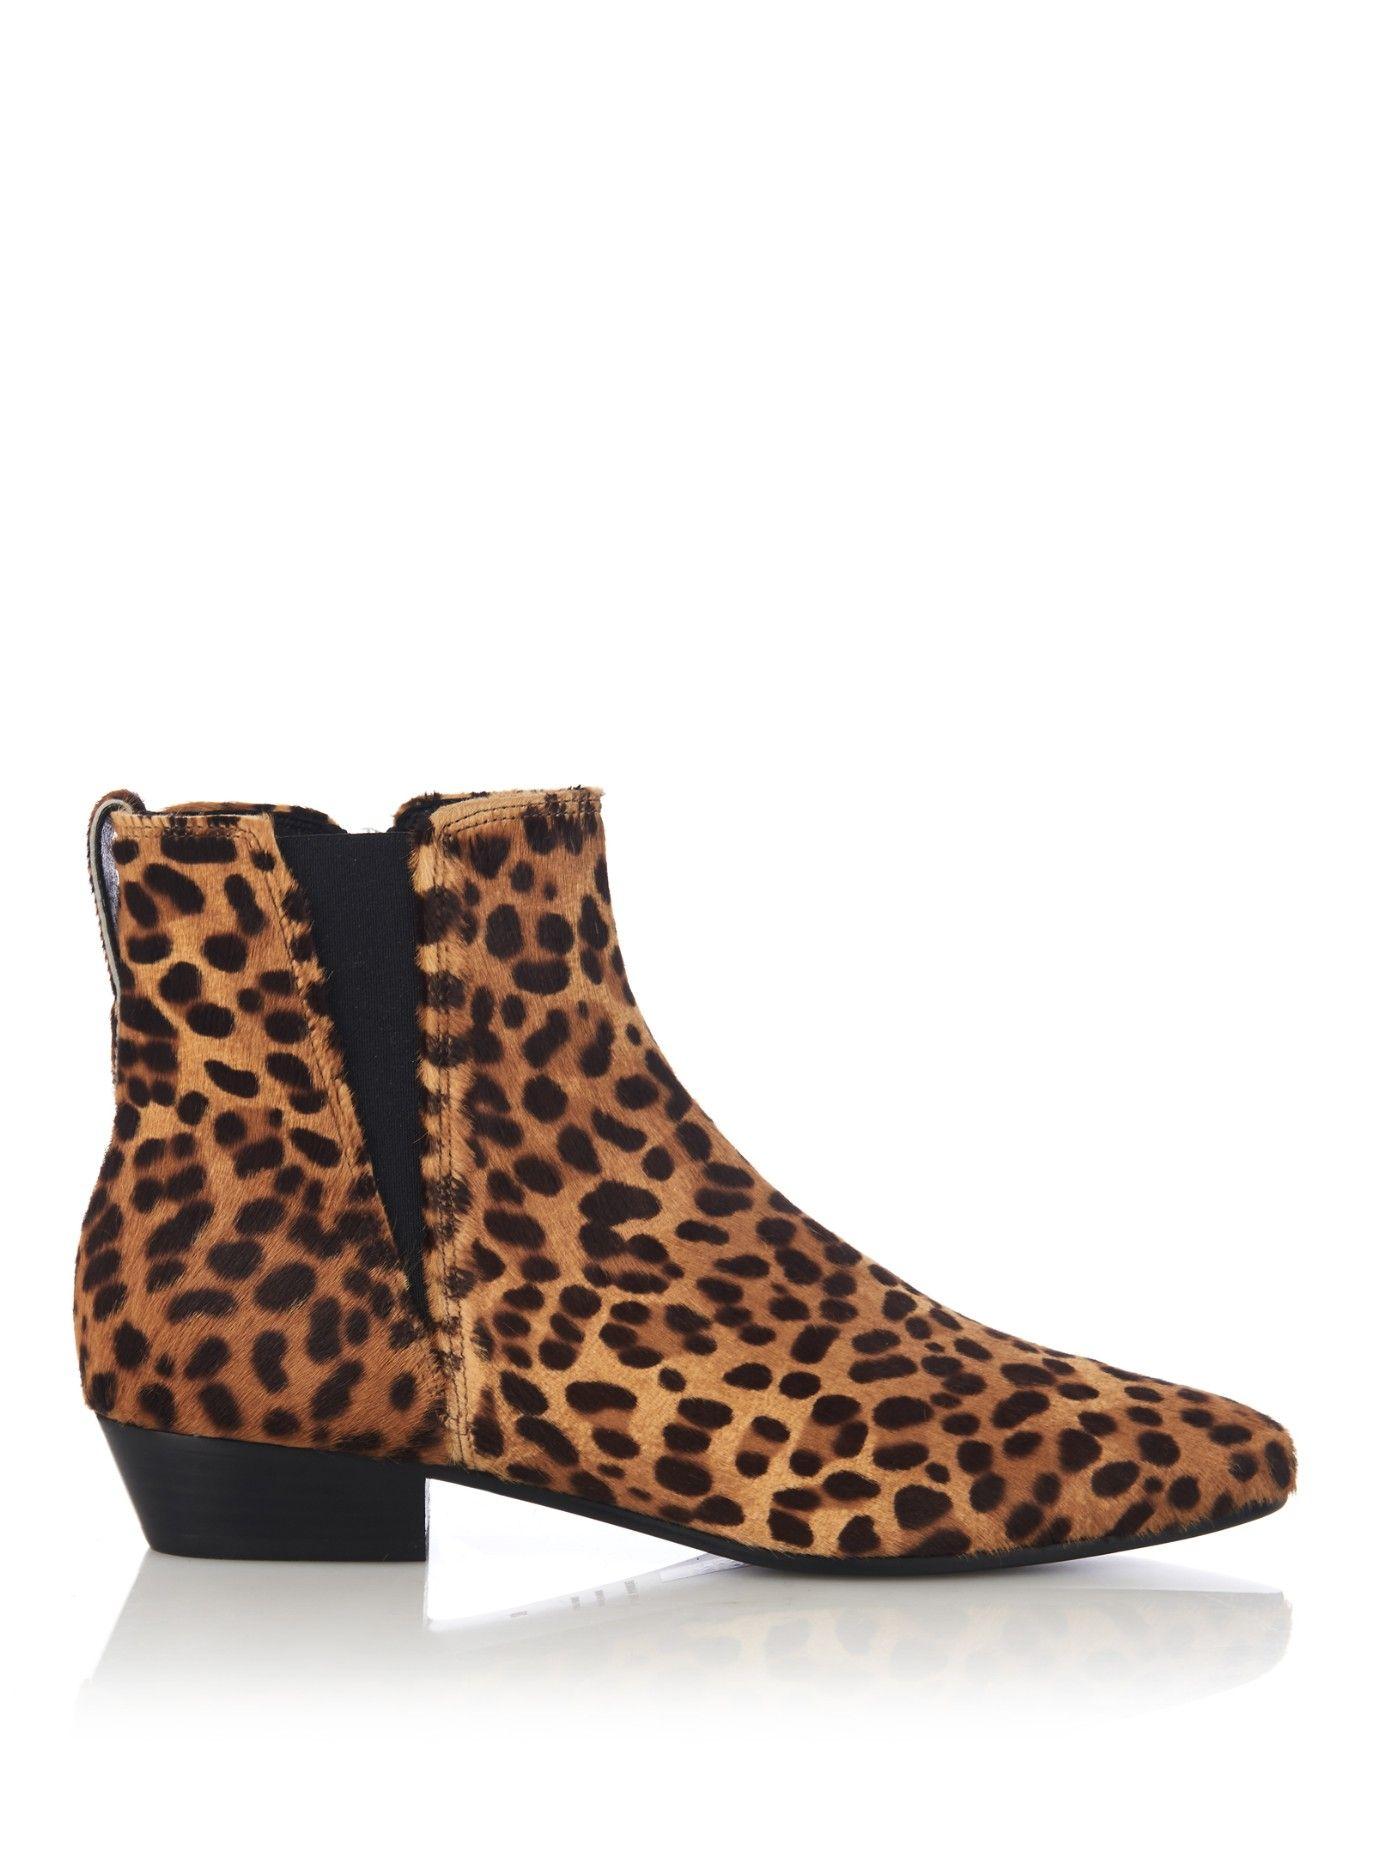 11937abcd3d Patsha leopard calf-hair chelsea boots | Isabel Marant | MATCHESFASHION.COM